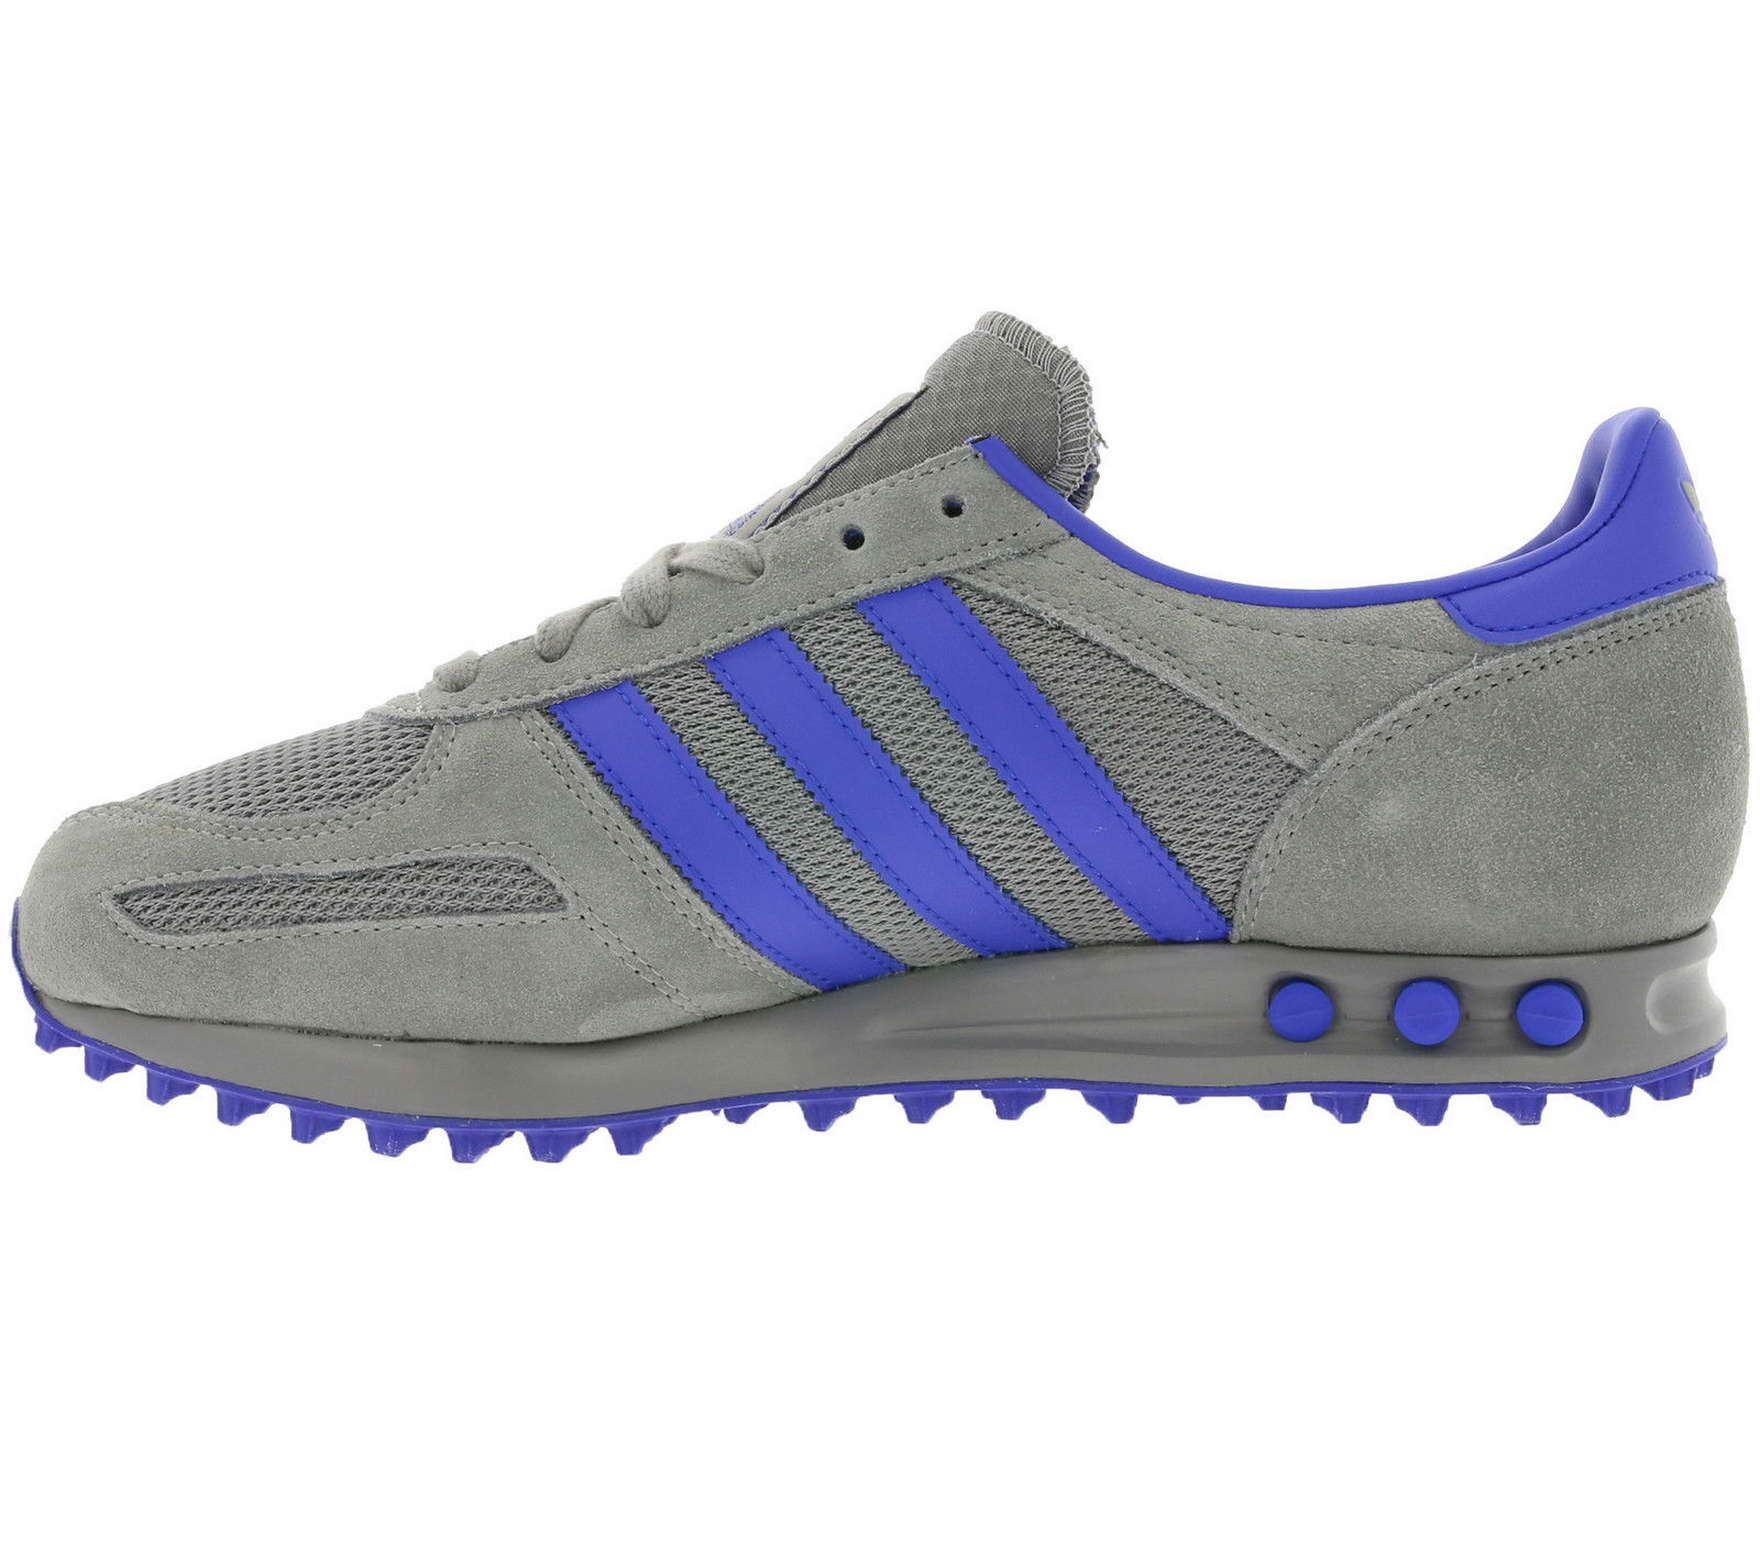 ... adidas Originals LA Trainer Retro Trainers Mens Grey/Blue Casual Sneakers  Shoes